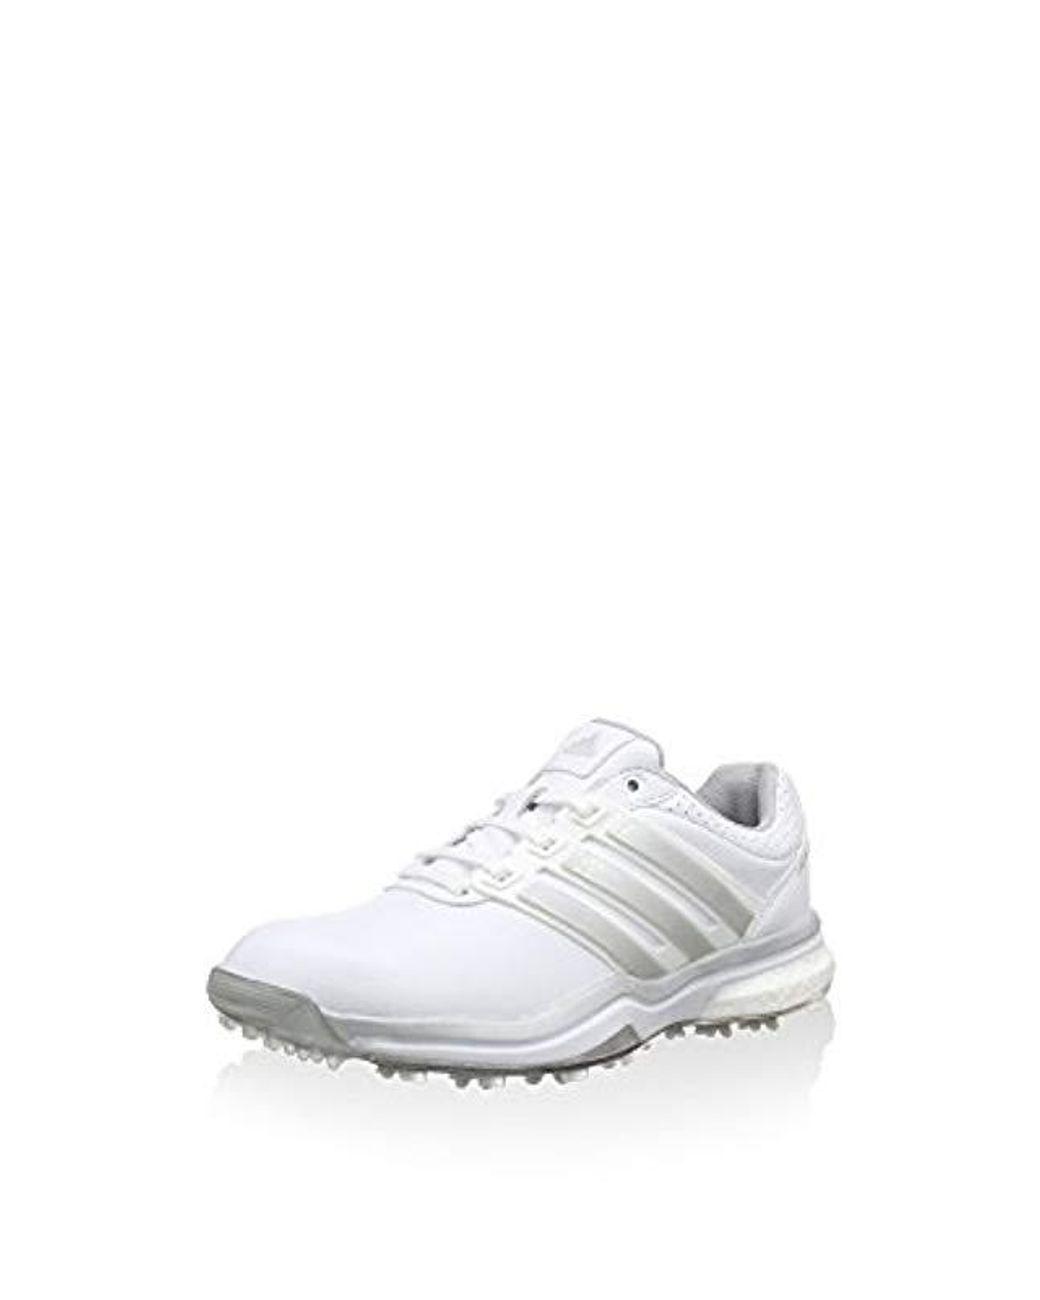 8ec074033b0bd Women's White Adipower Boost 2 Golf Shoes